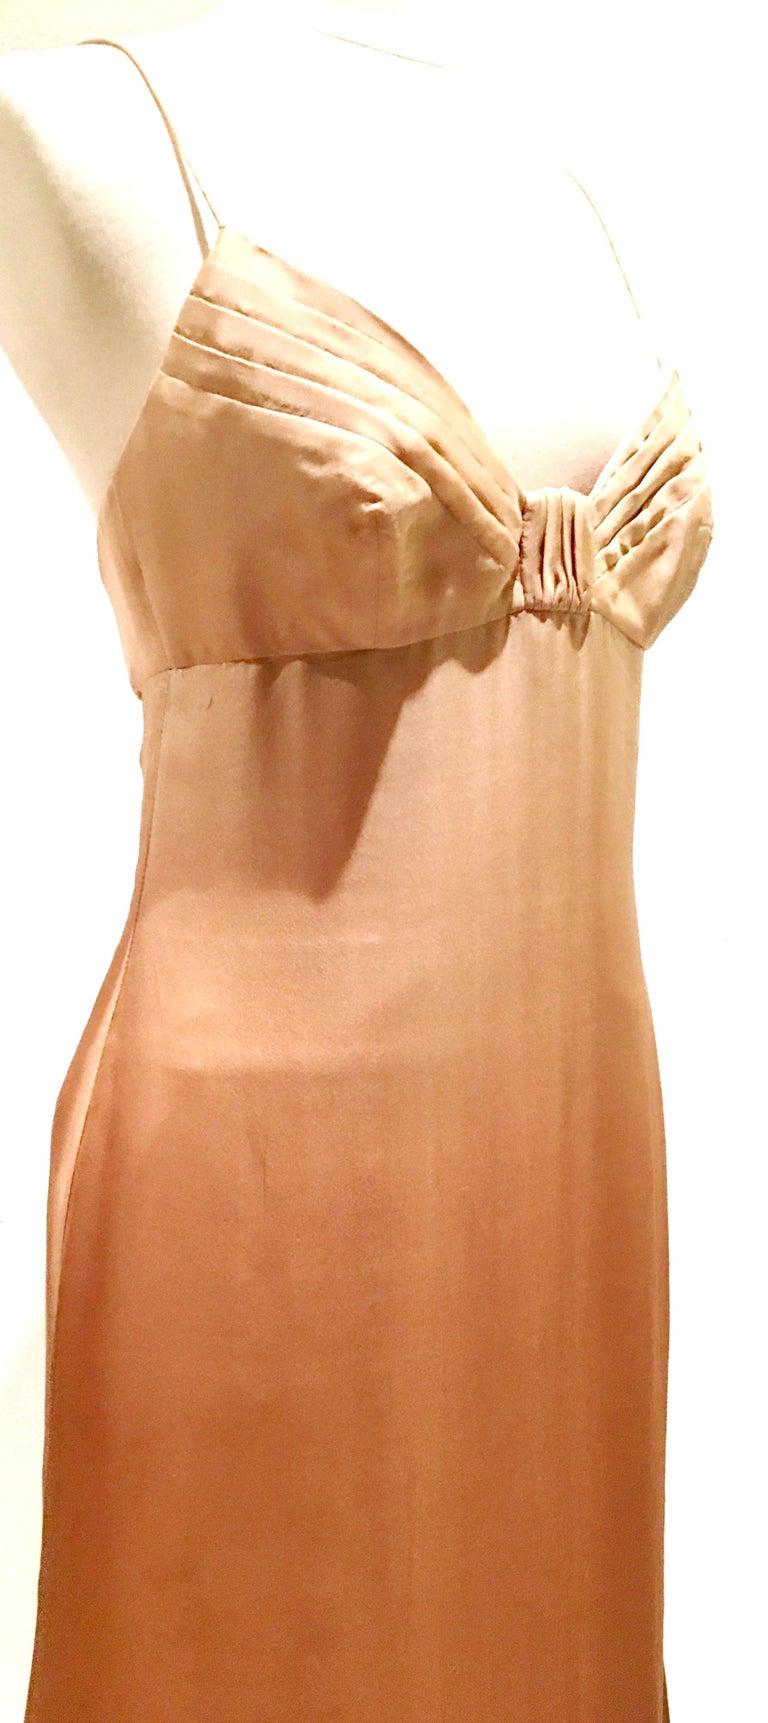 21st Century Italian Silk Chiffon Slip Dress By Girogio Armani - Size 42 For Sale 1